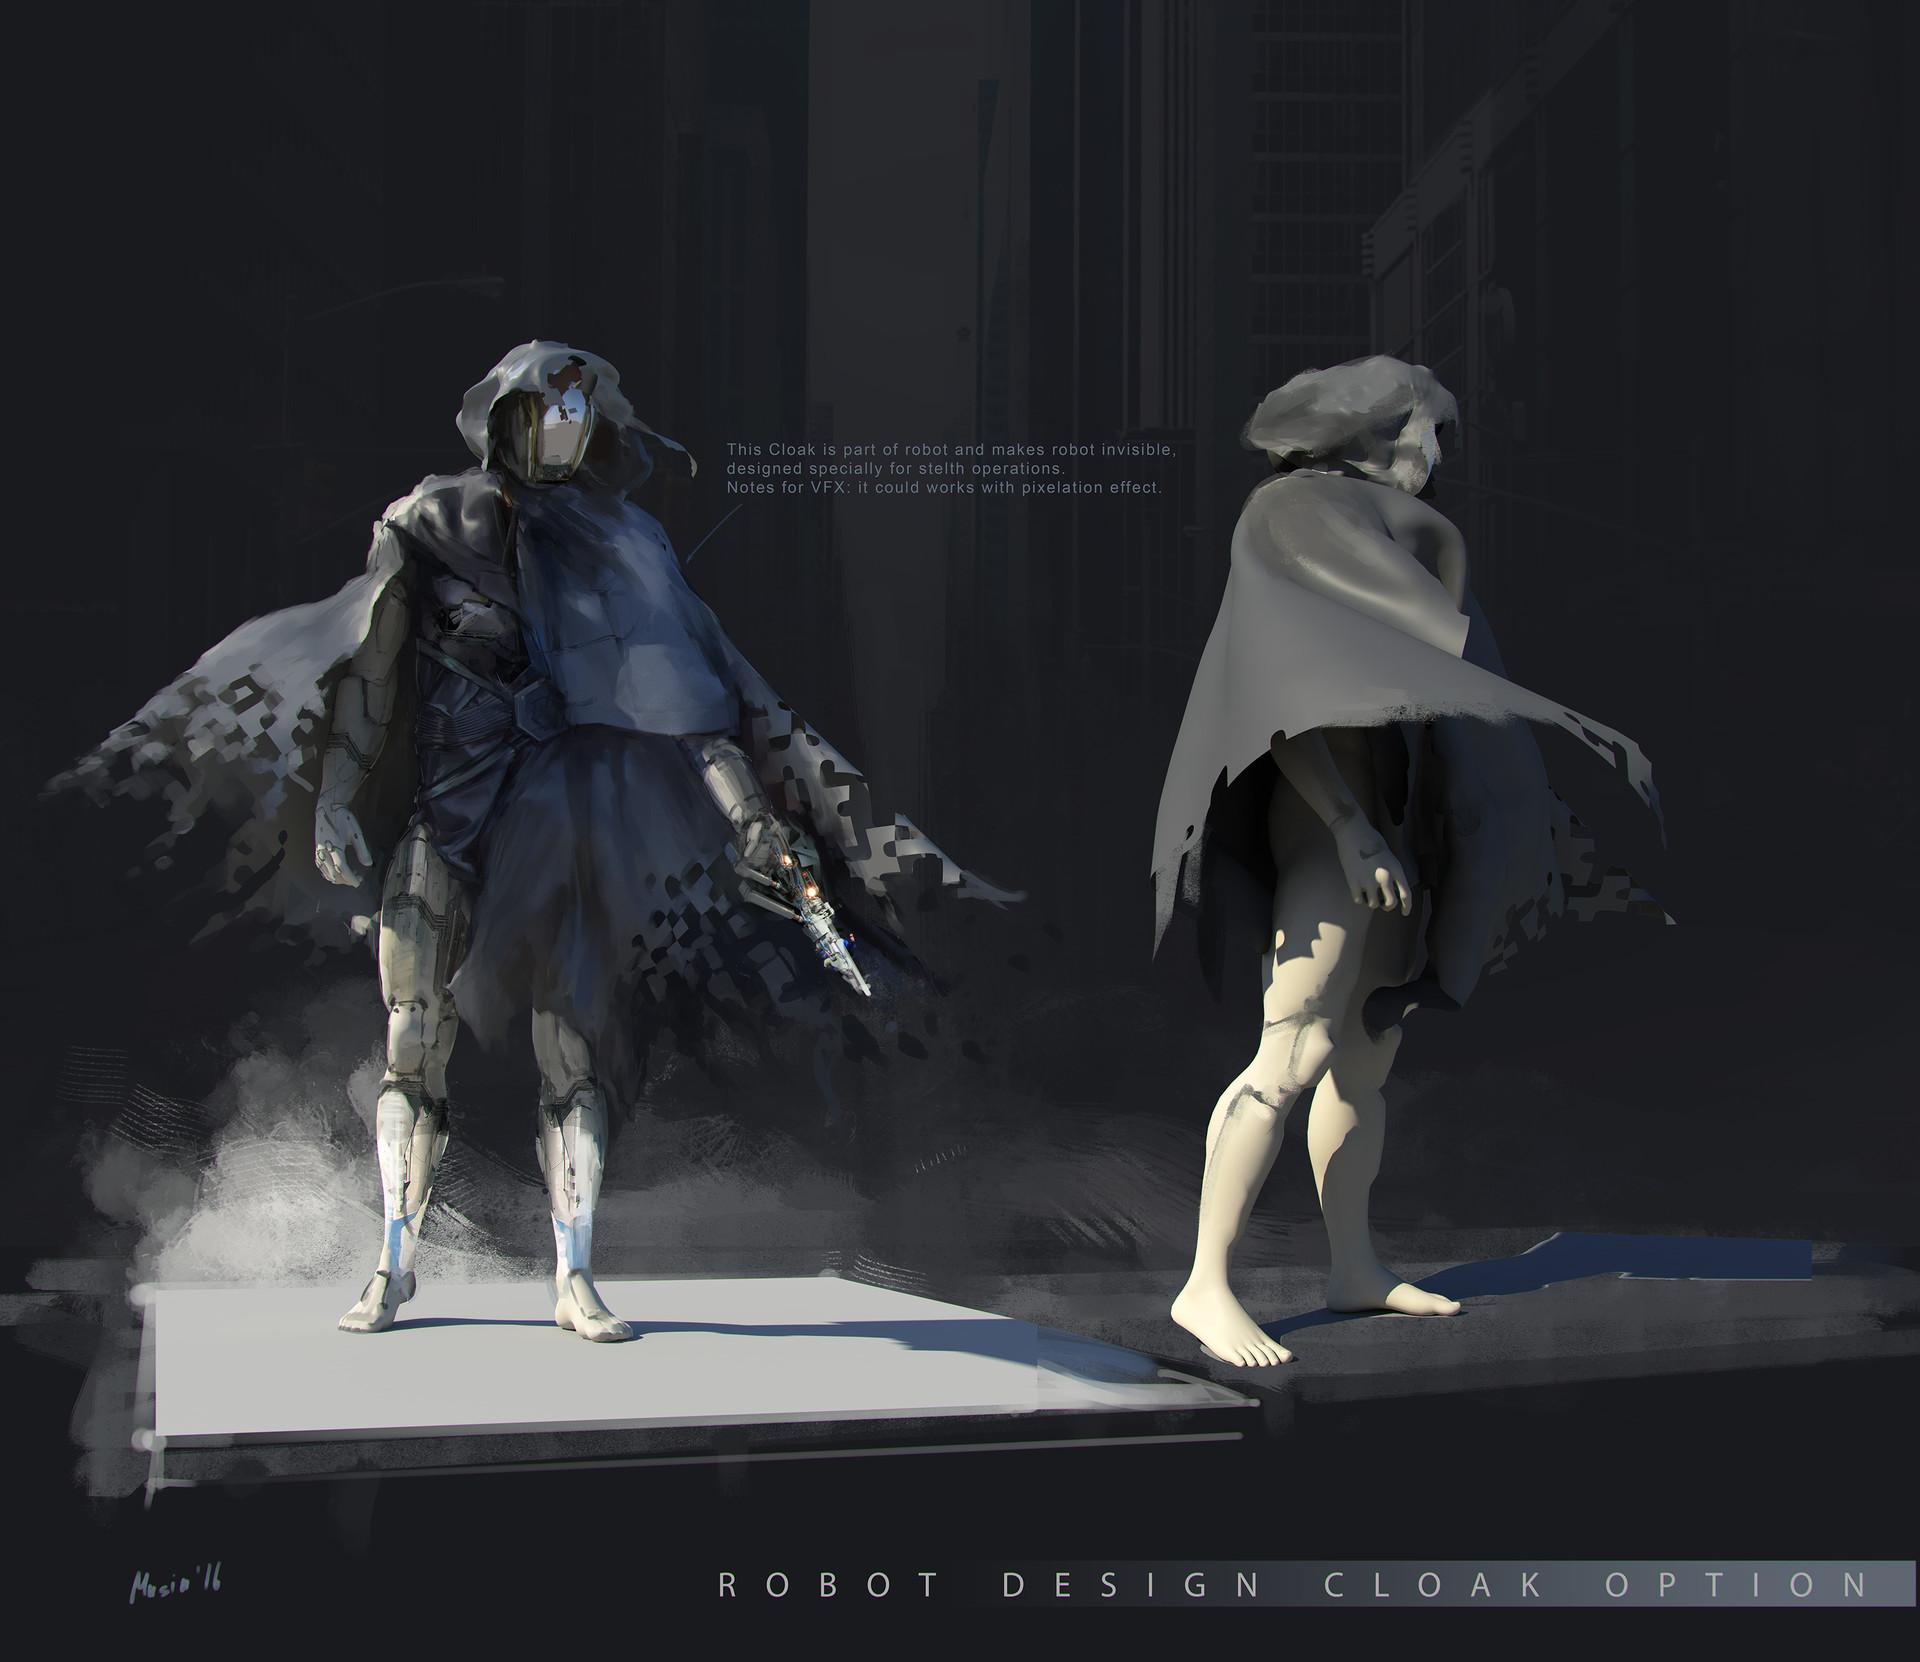 Sergey musin robotdesignvariations omline ghostconcept02